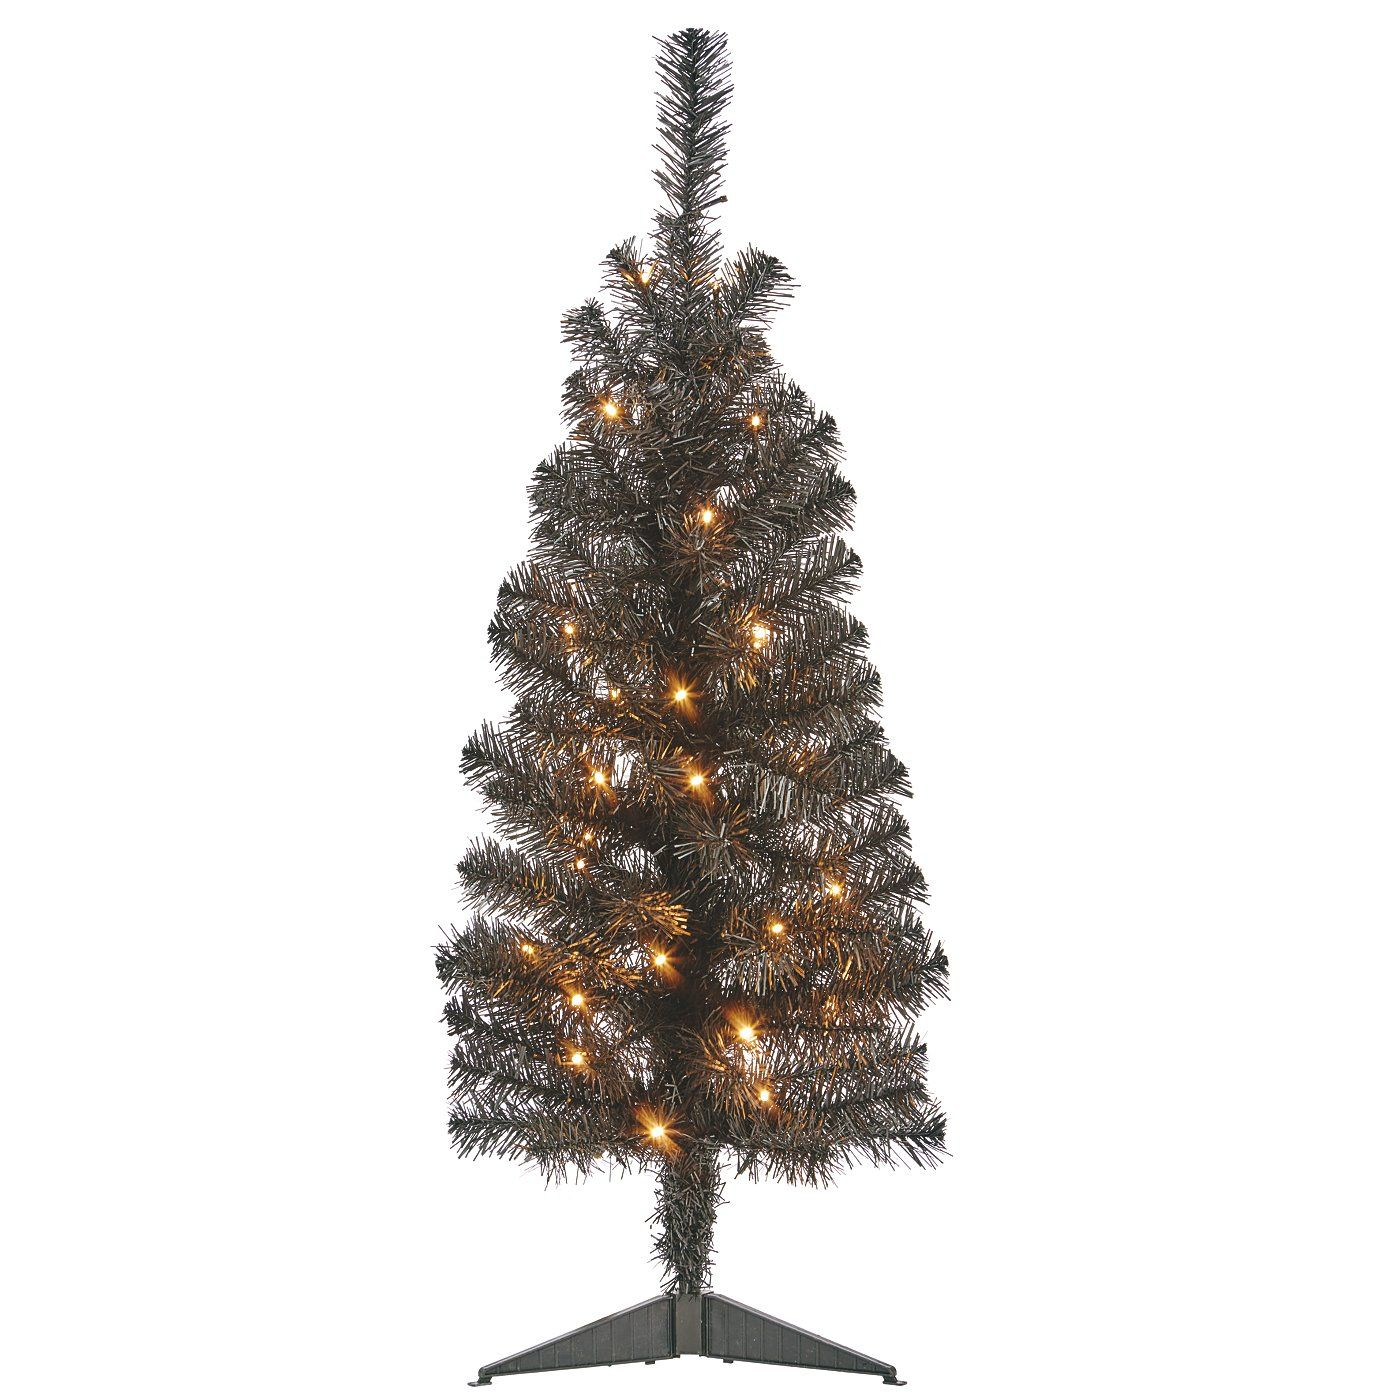 3FT Black PreLit Tree Christmas Trees ASDA direct